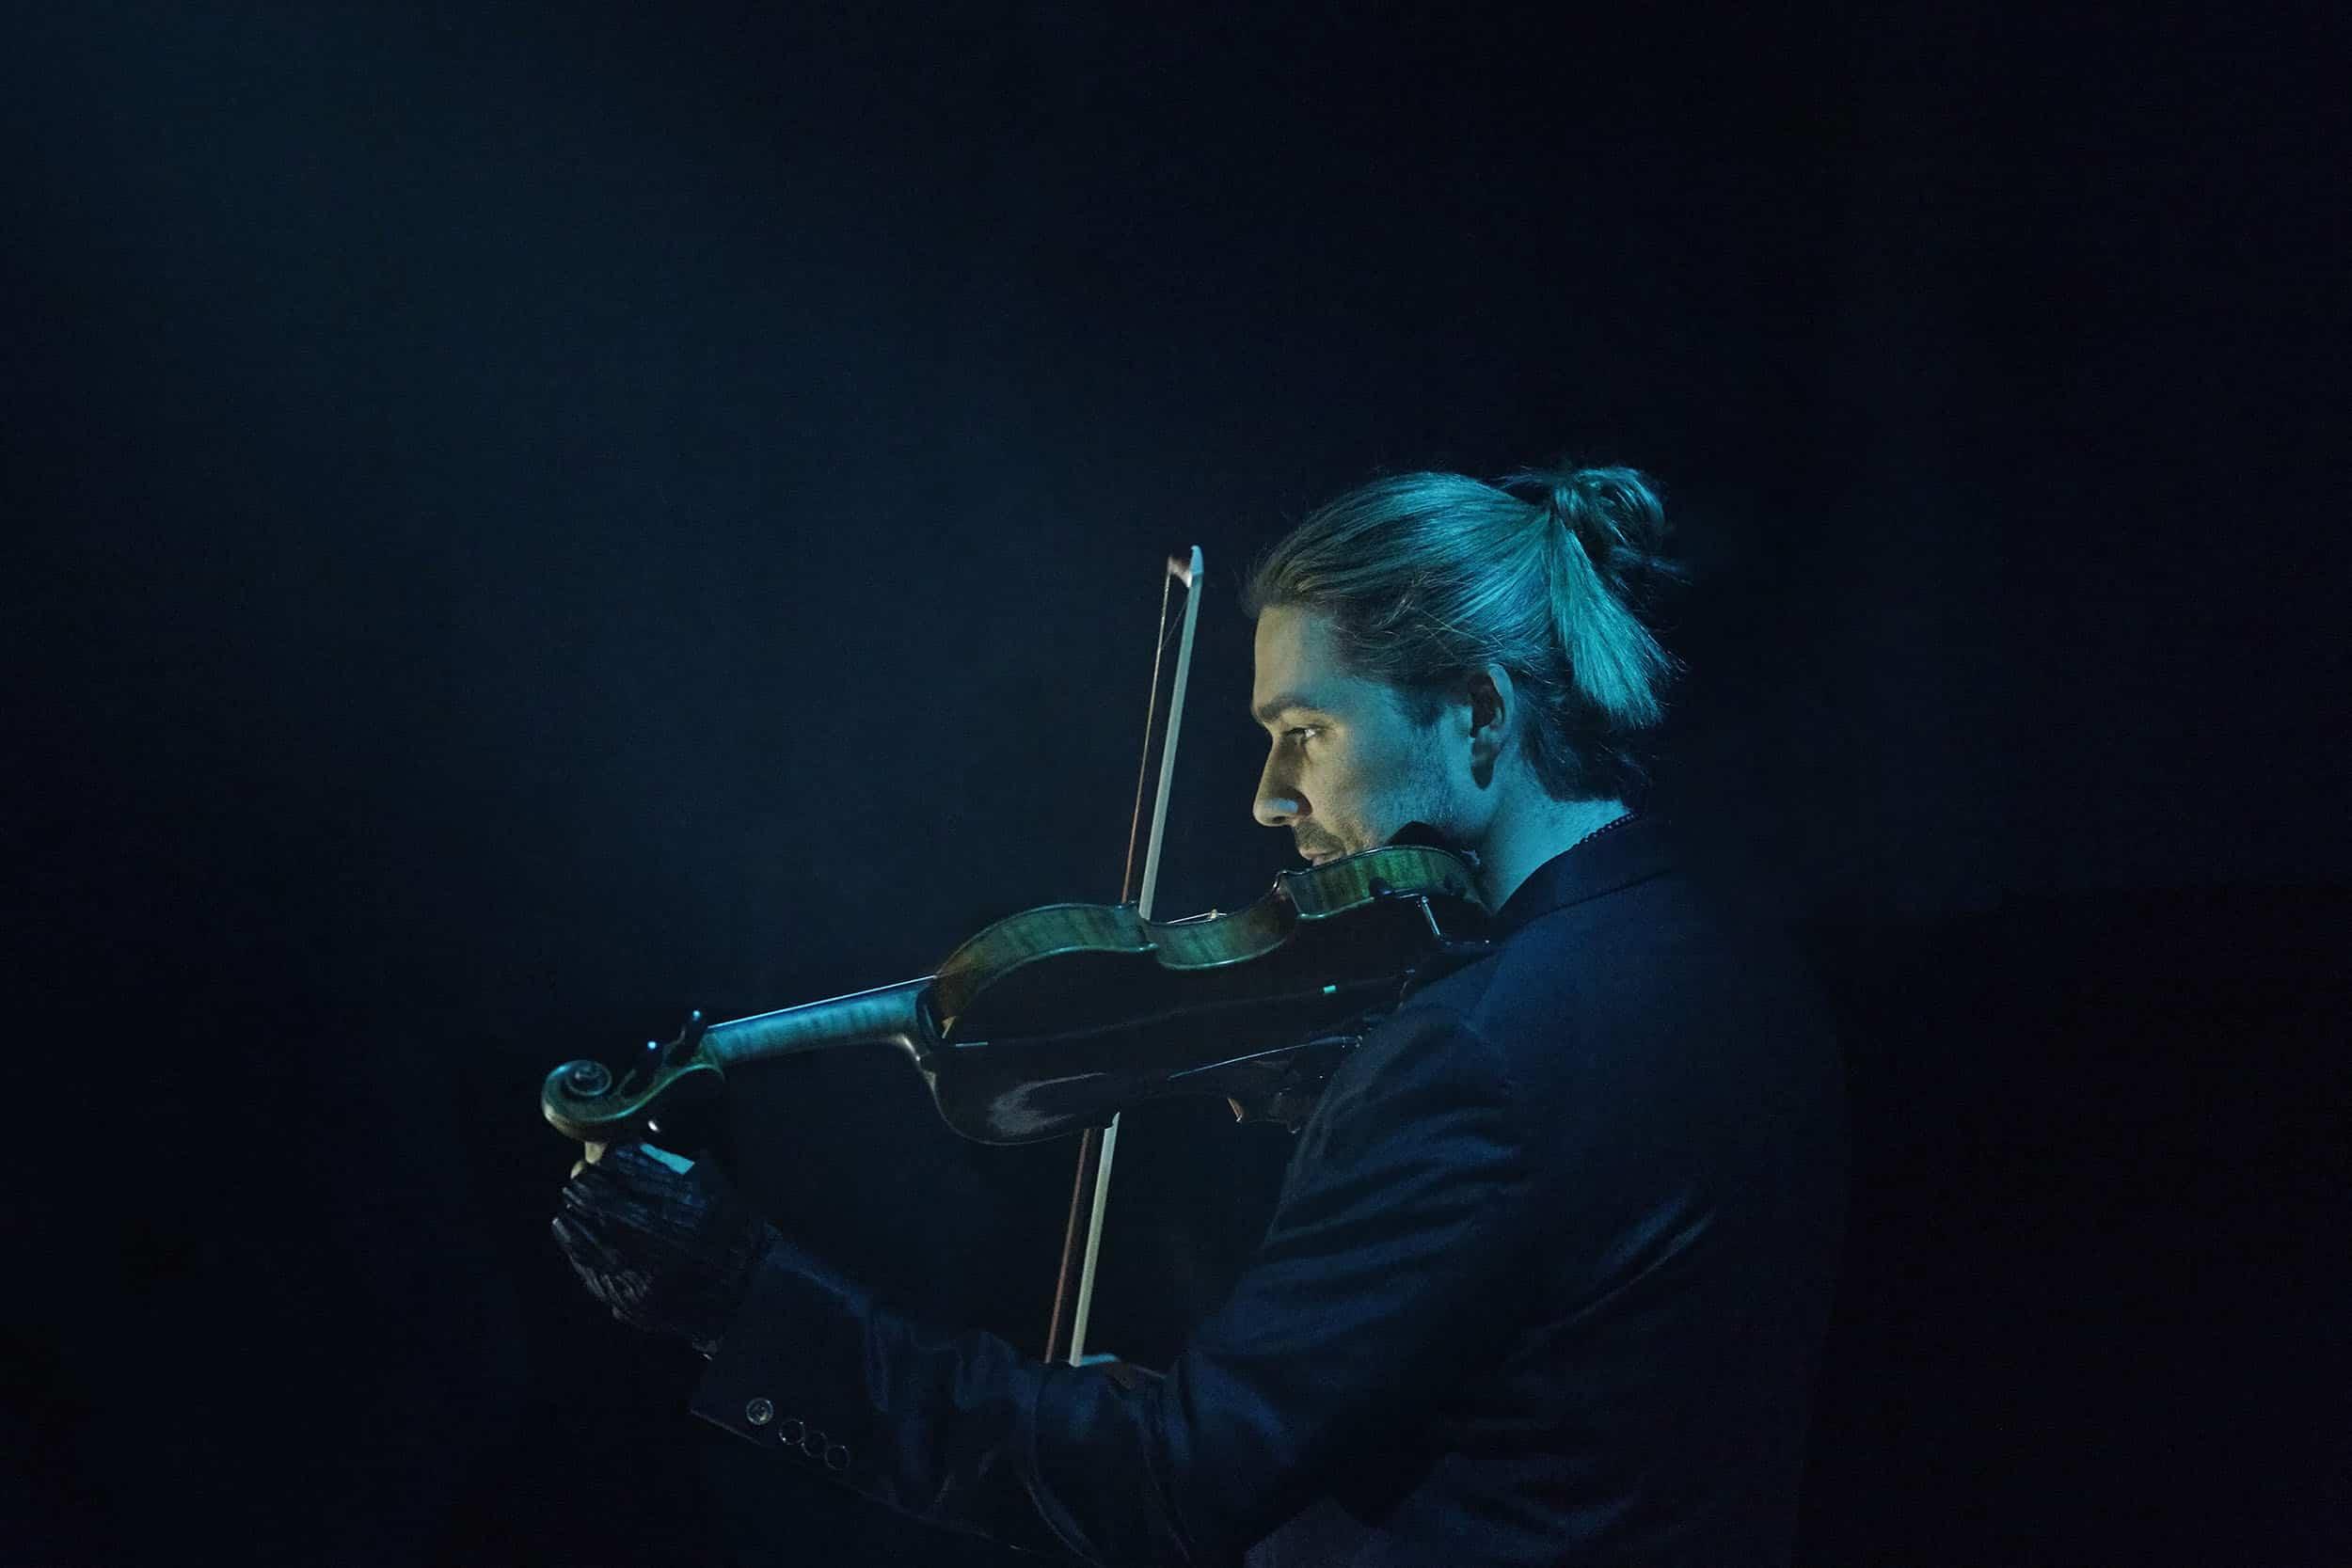 studio-ignatov-musicians-david-garrett-04